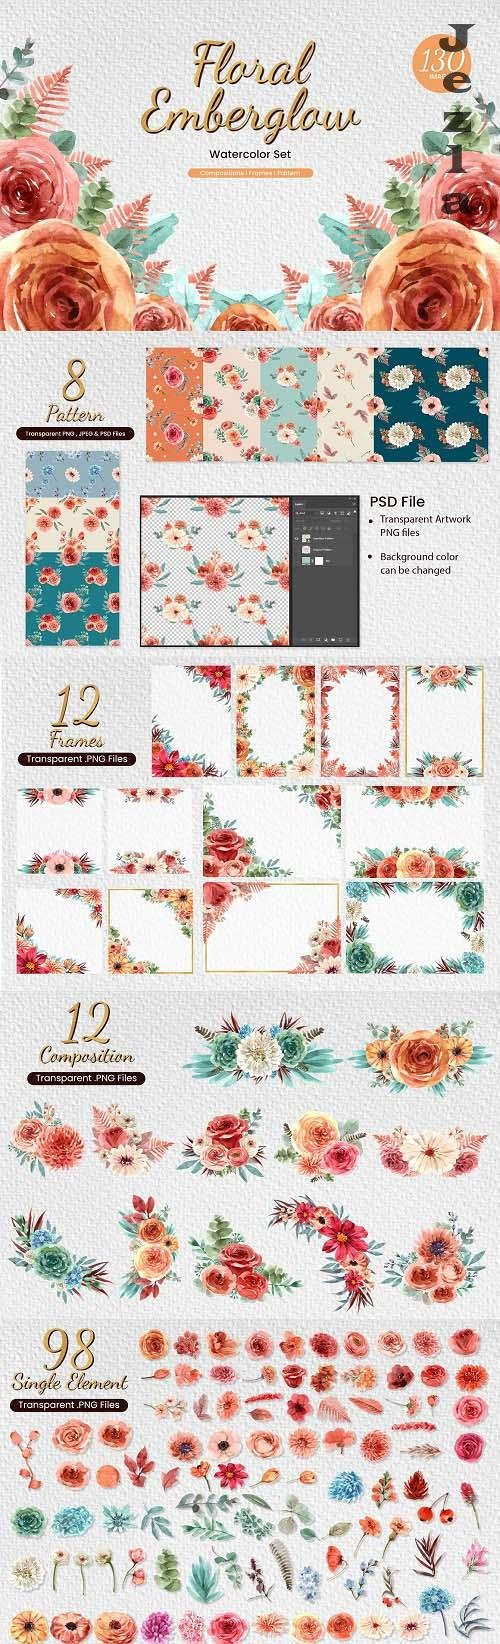 Floral Emberglow loose watercolor - 6298141